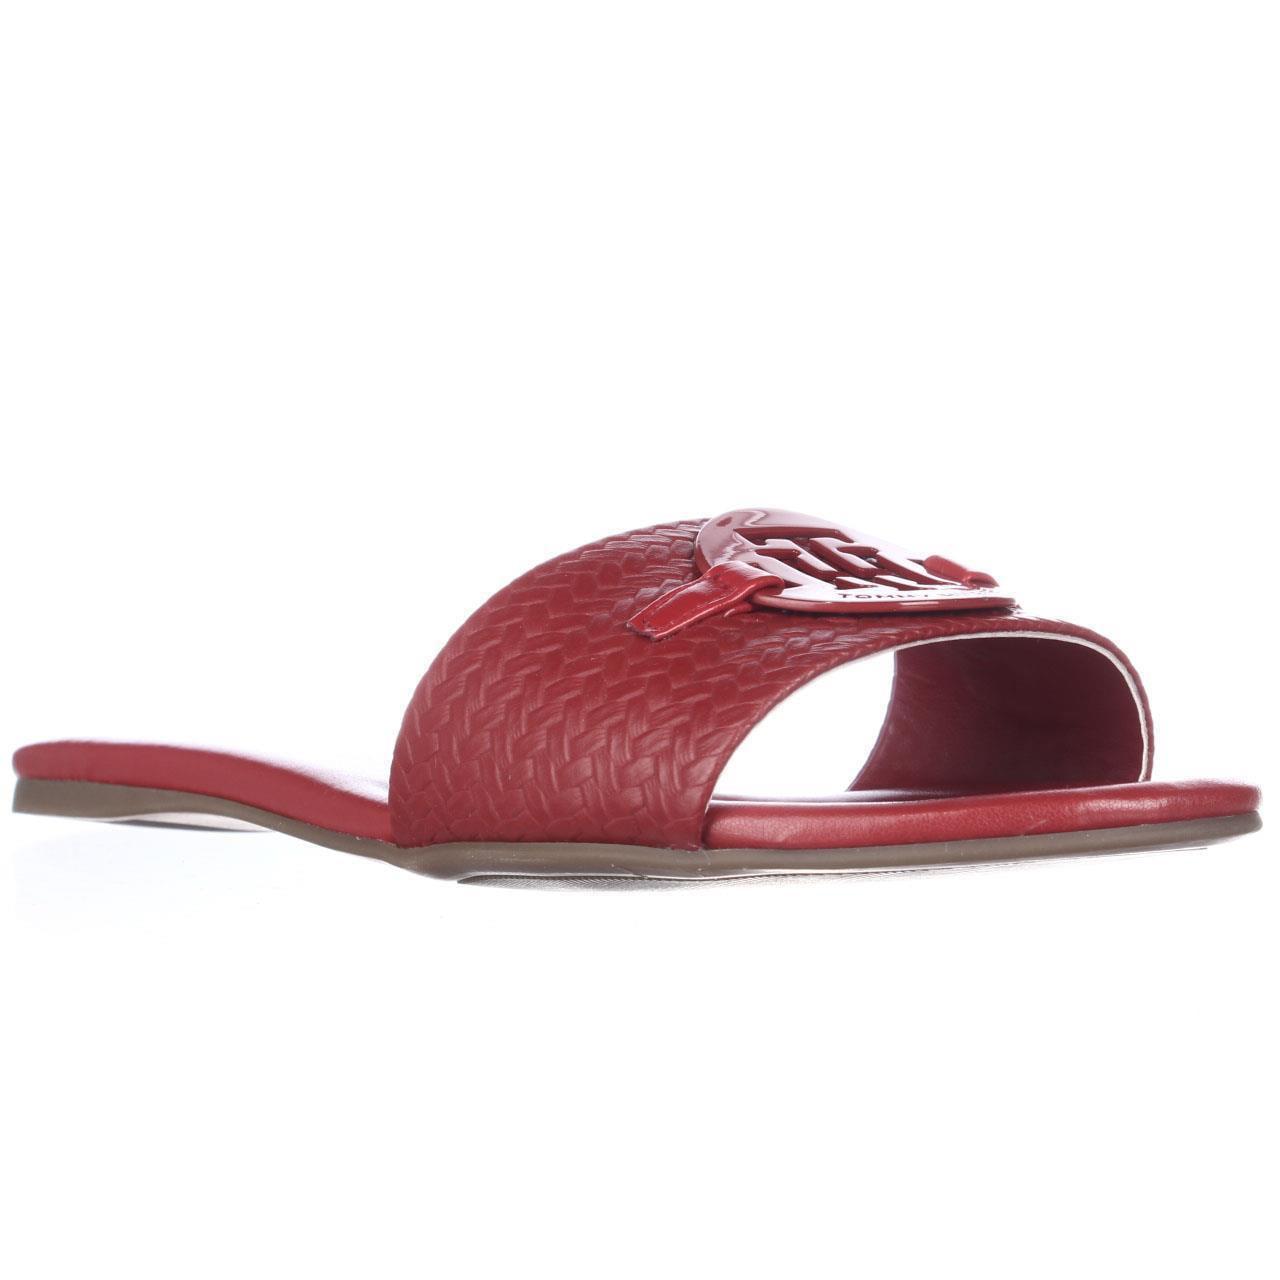 Womens Tommy Hilfiger Fabre Flat Slide Sandals - Medium Red